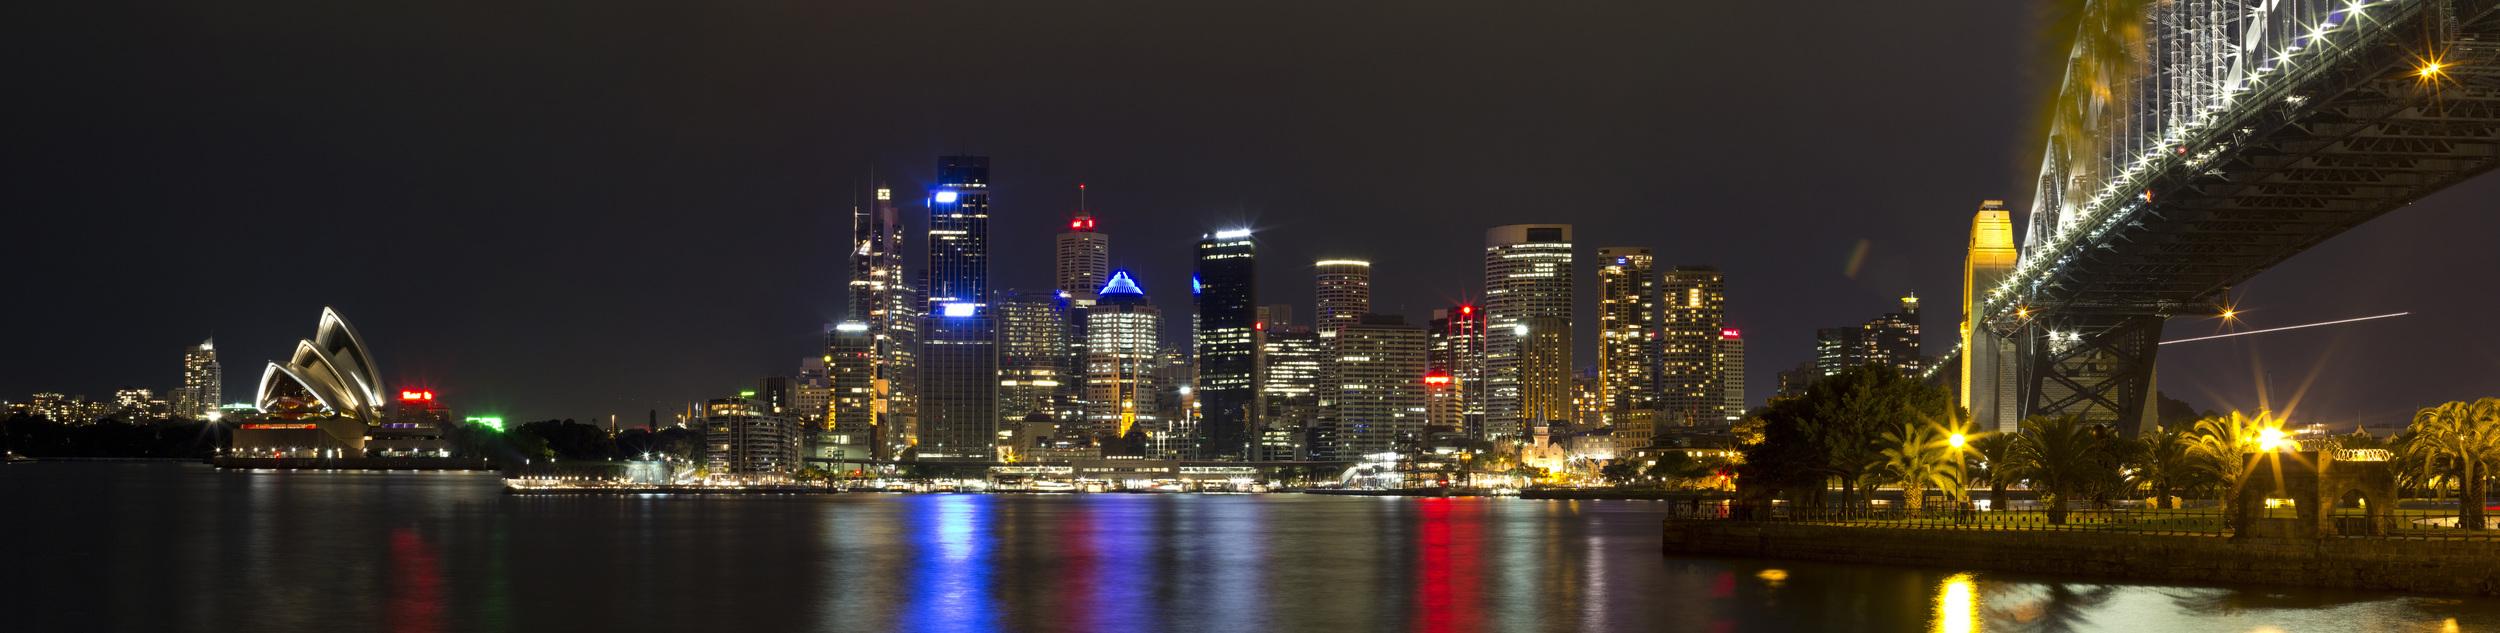 Sydney_Nighttime Harbor Bridge Opera House Lookout Panarama 5.jpg